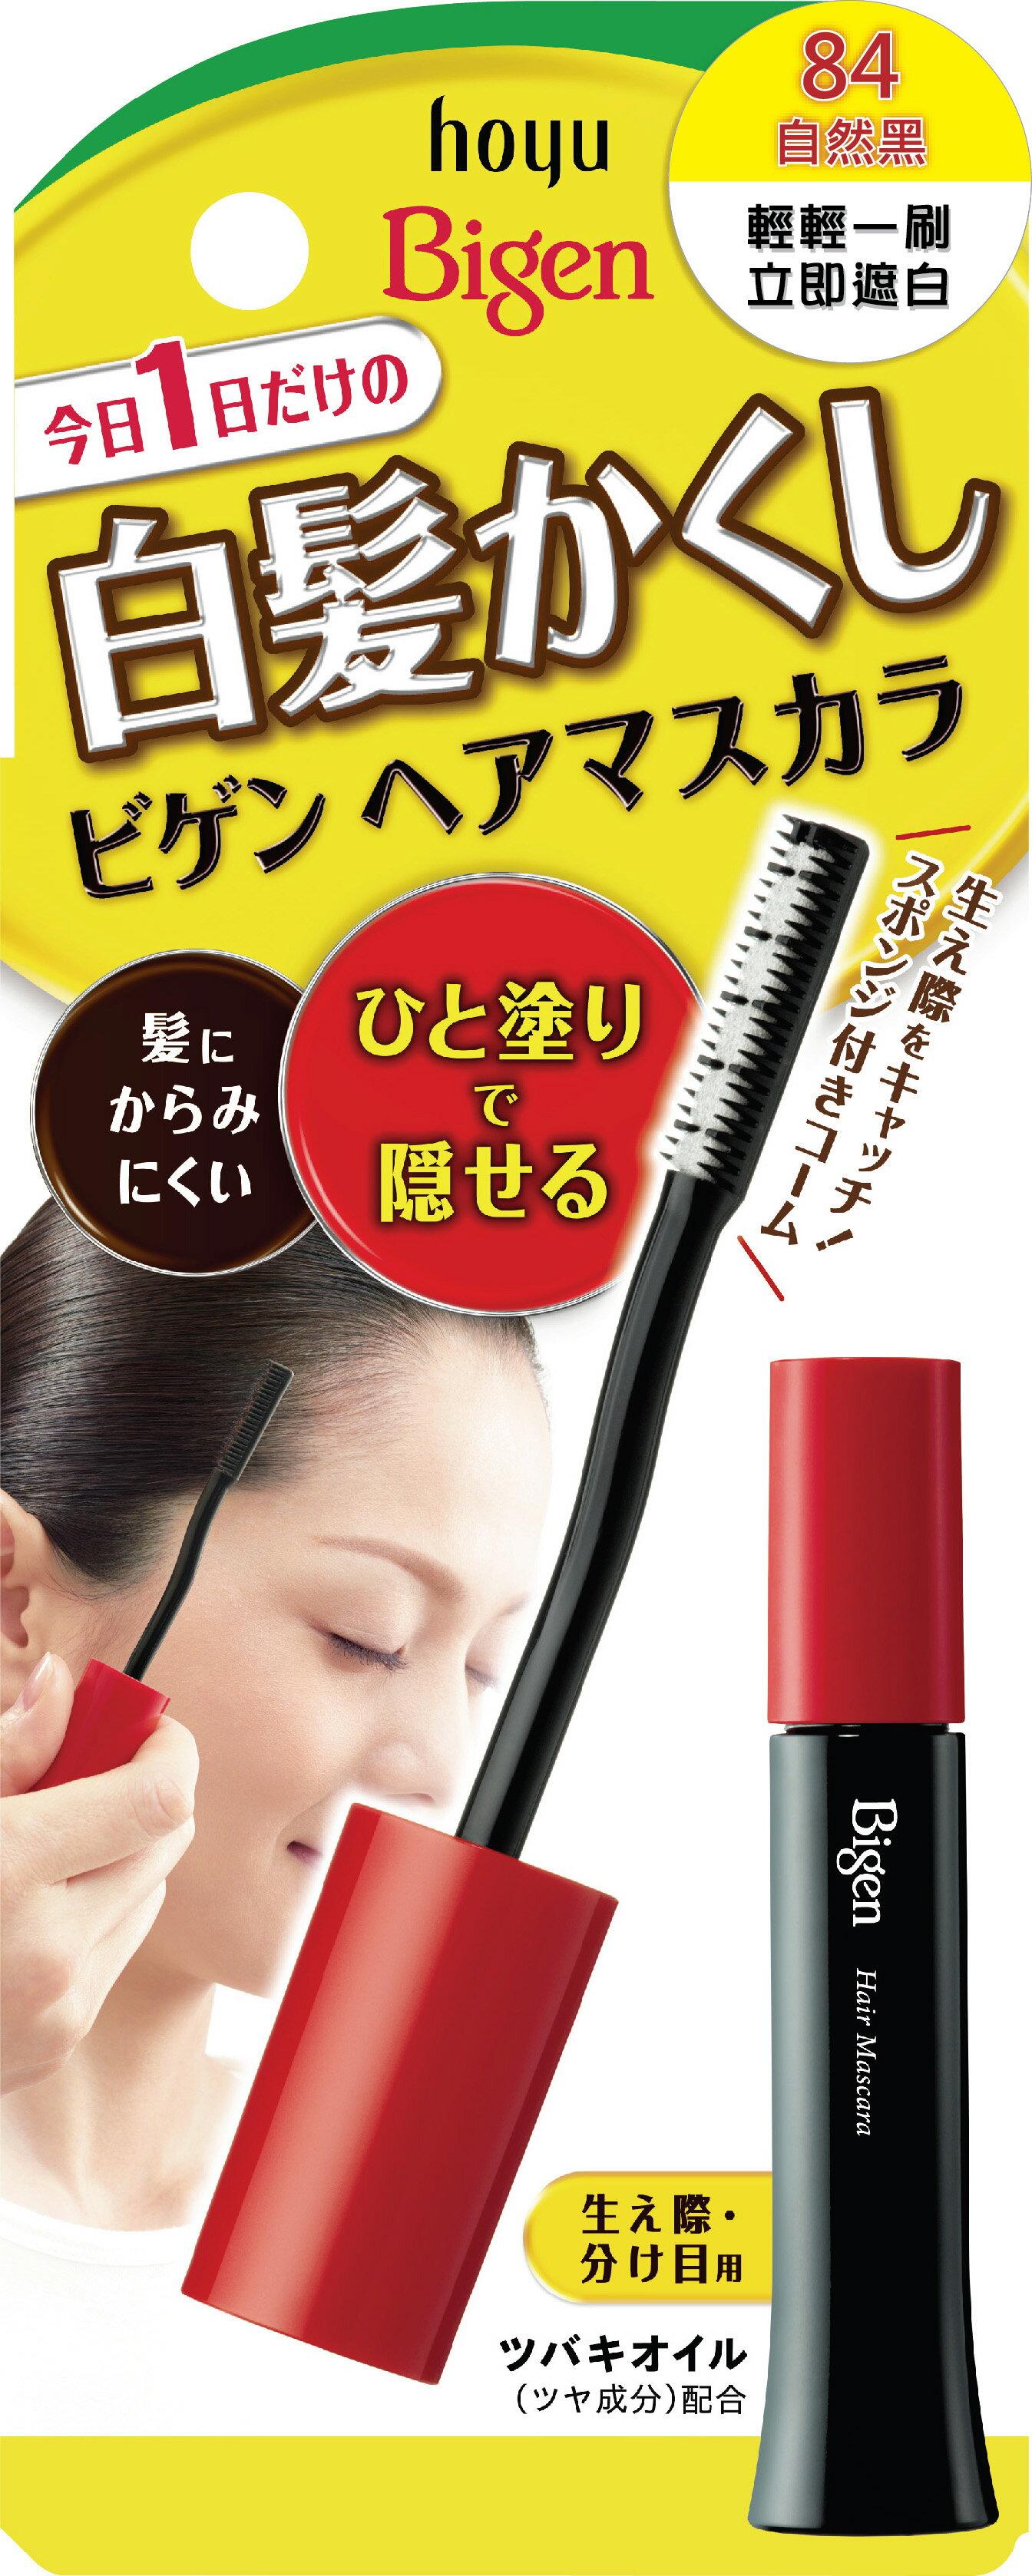 Bigen美源 白髮專用補色筆【84】自然黑色 - 限時優惠好康折扣